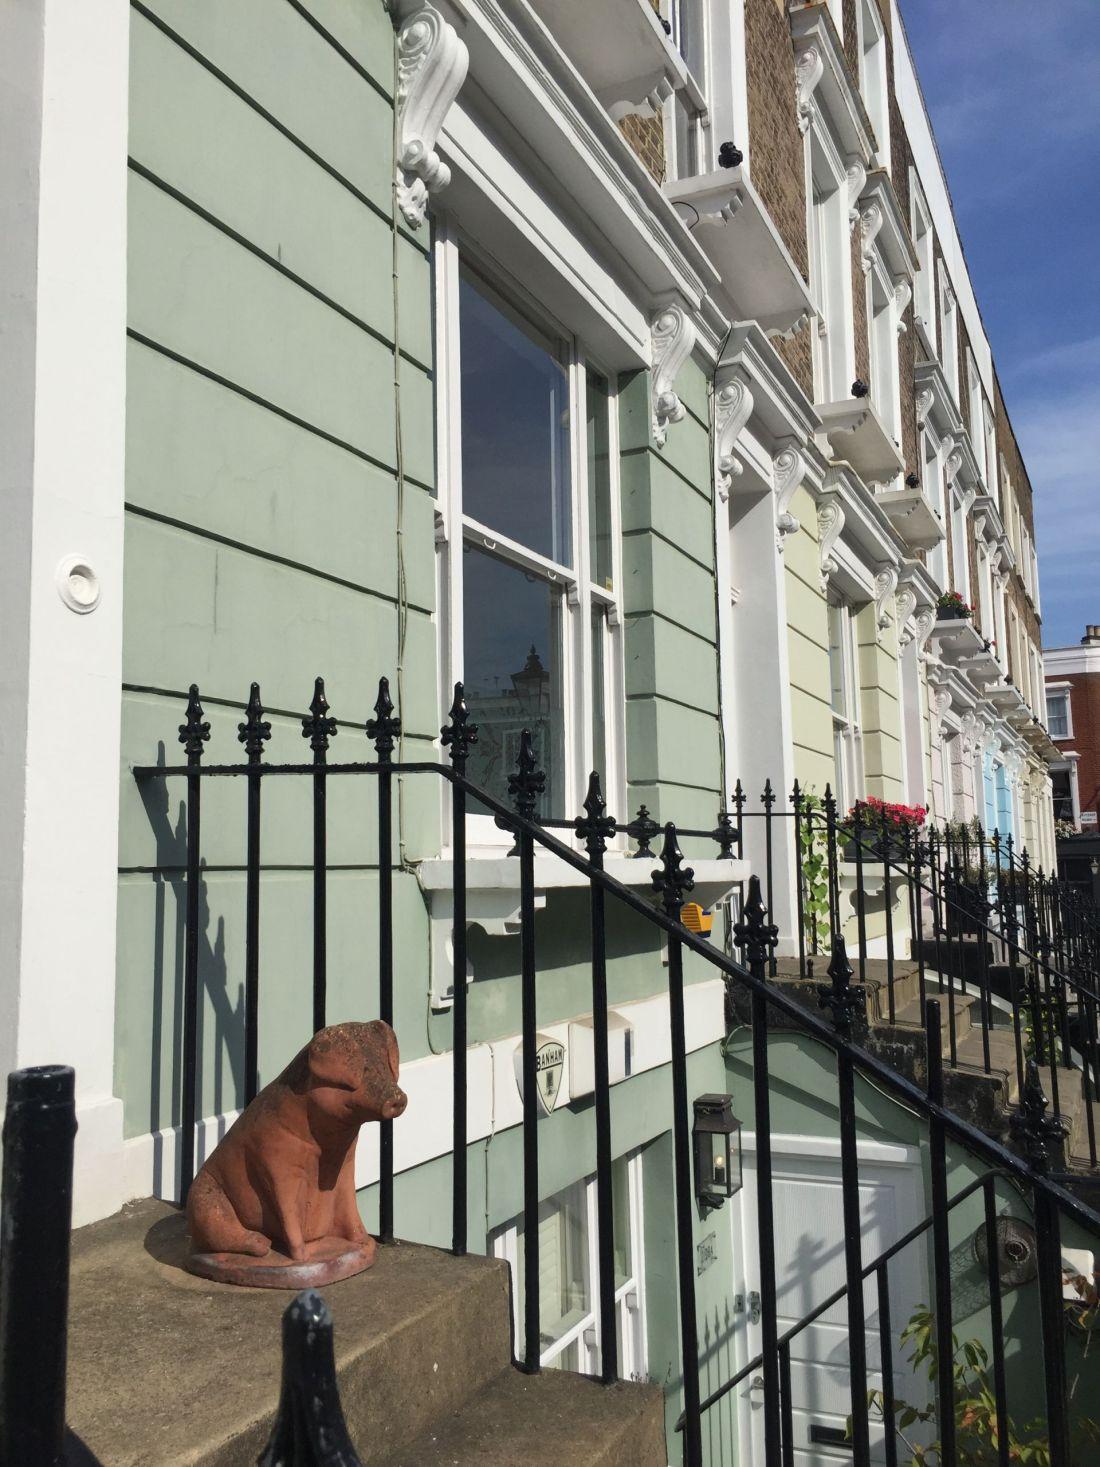 Streets of Primrose Hill, London